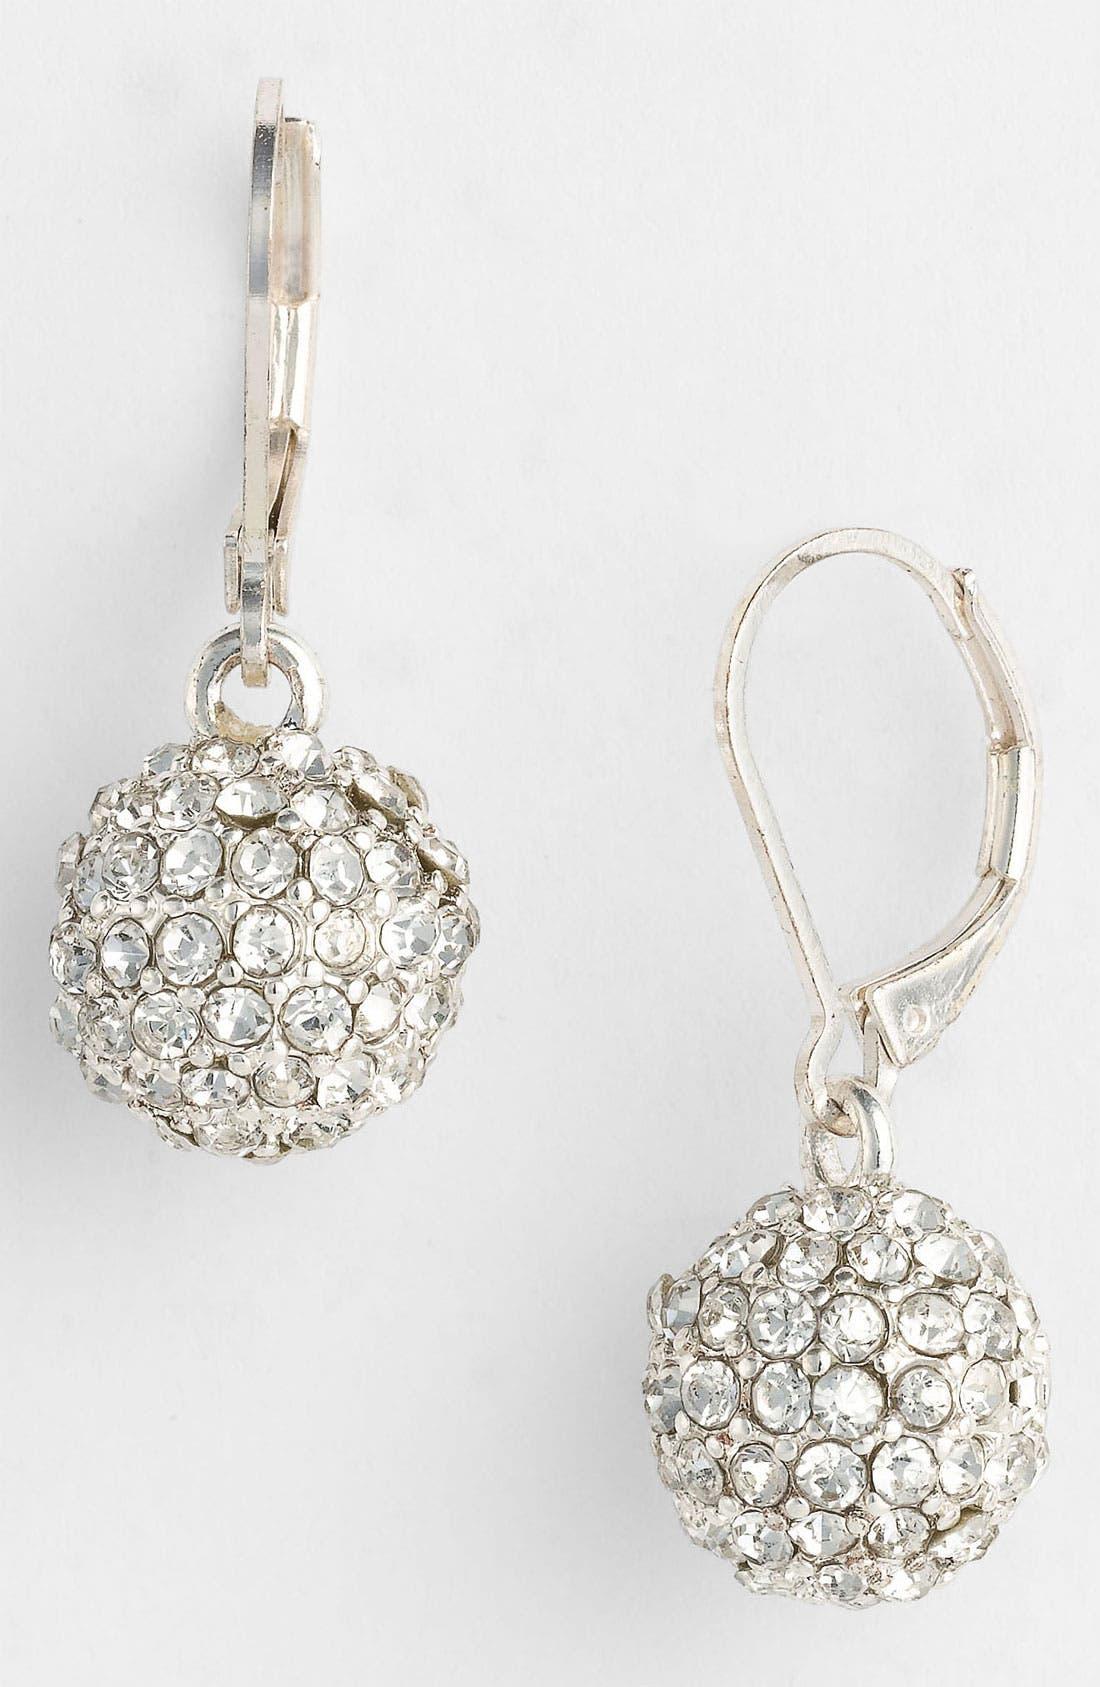 Alternate Image 1 Selected - Anne Klein 'Fireball' Drop Earrings